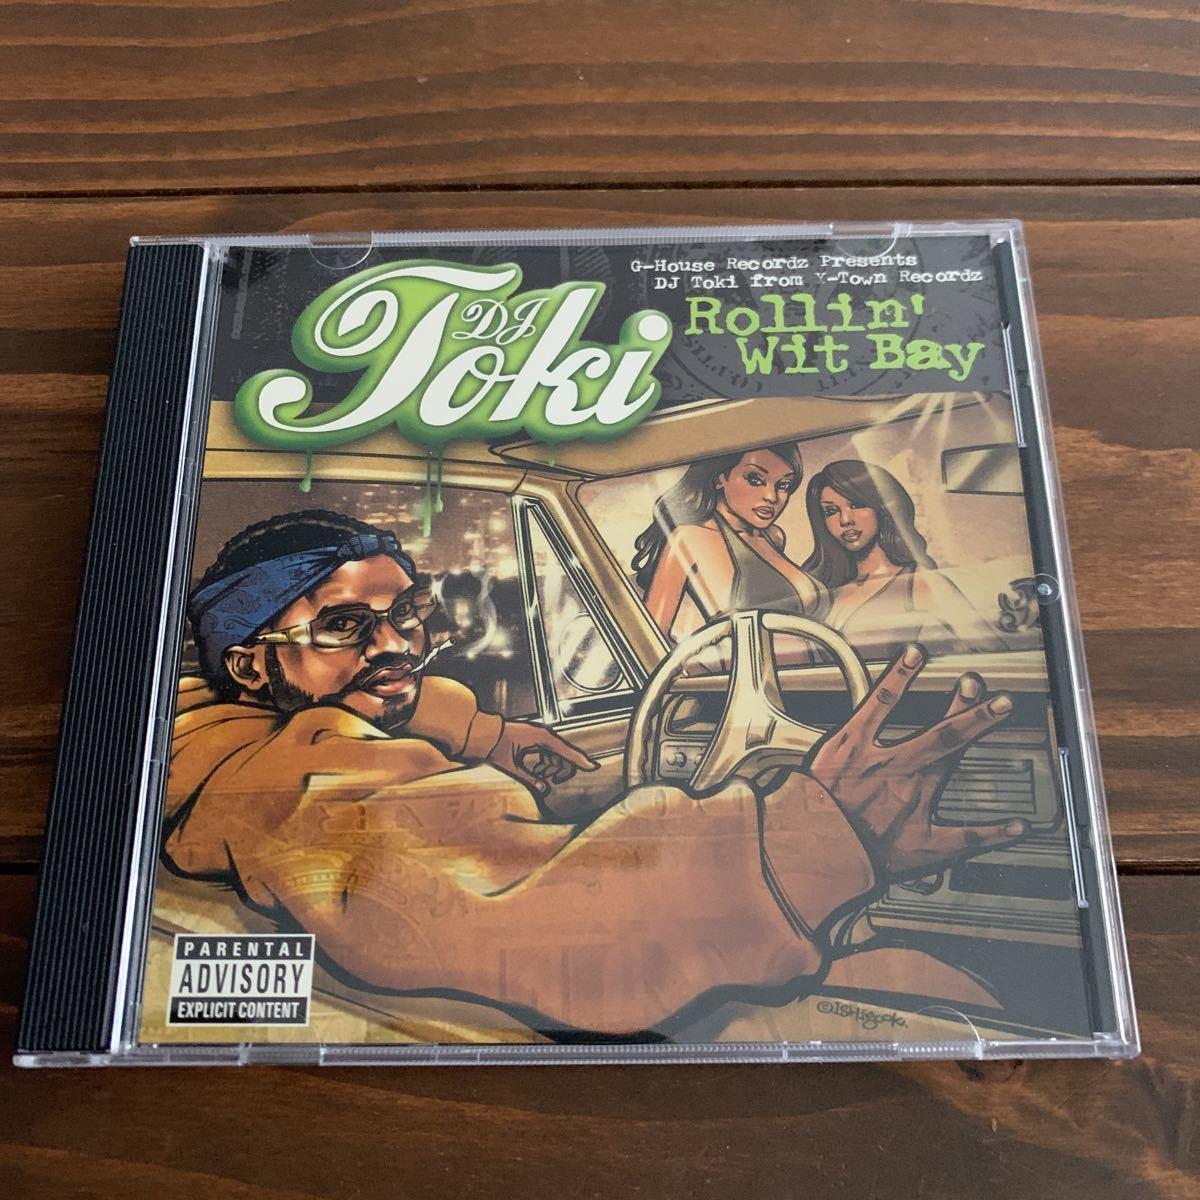 RAP廃盤レアG-HOUSE03 DJ TOKI ローライダー